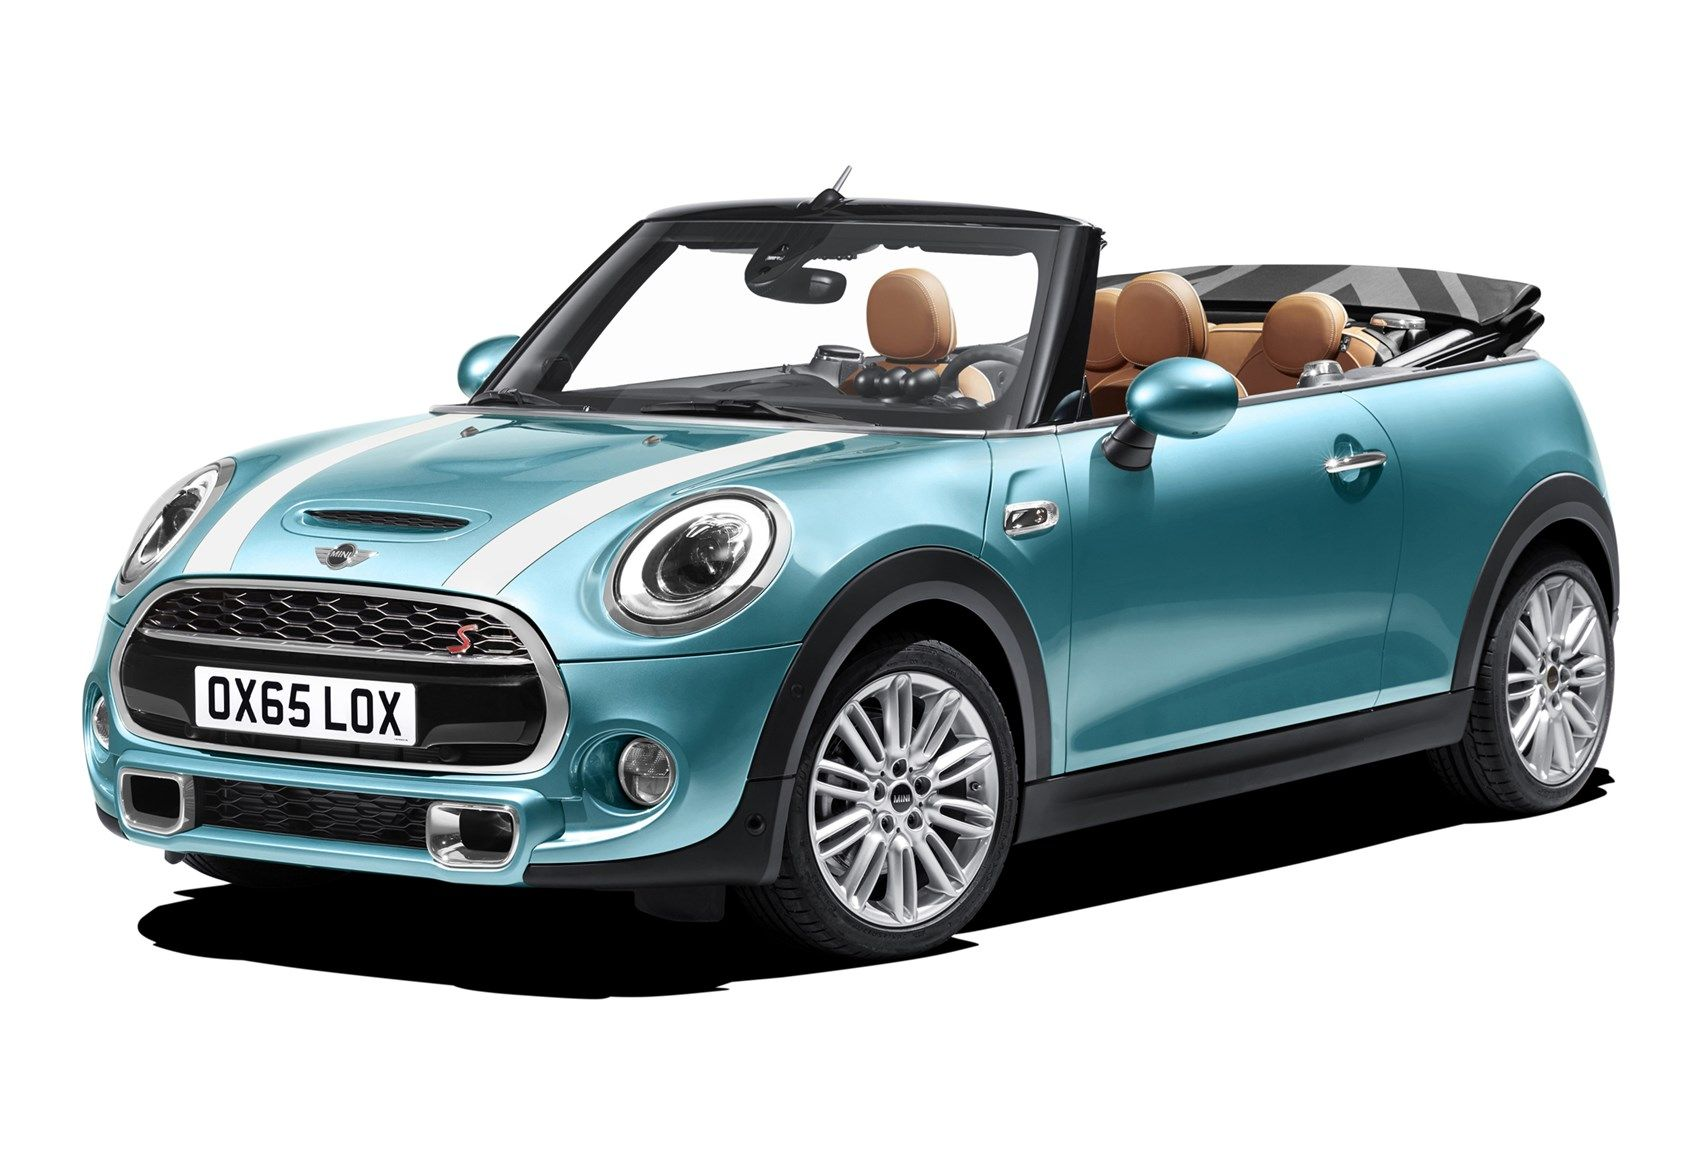 Caribbean Blue Mini With White Mini Convertible Mini Cooper Mini Cooper S